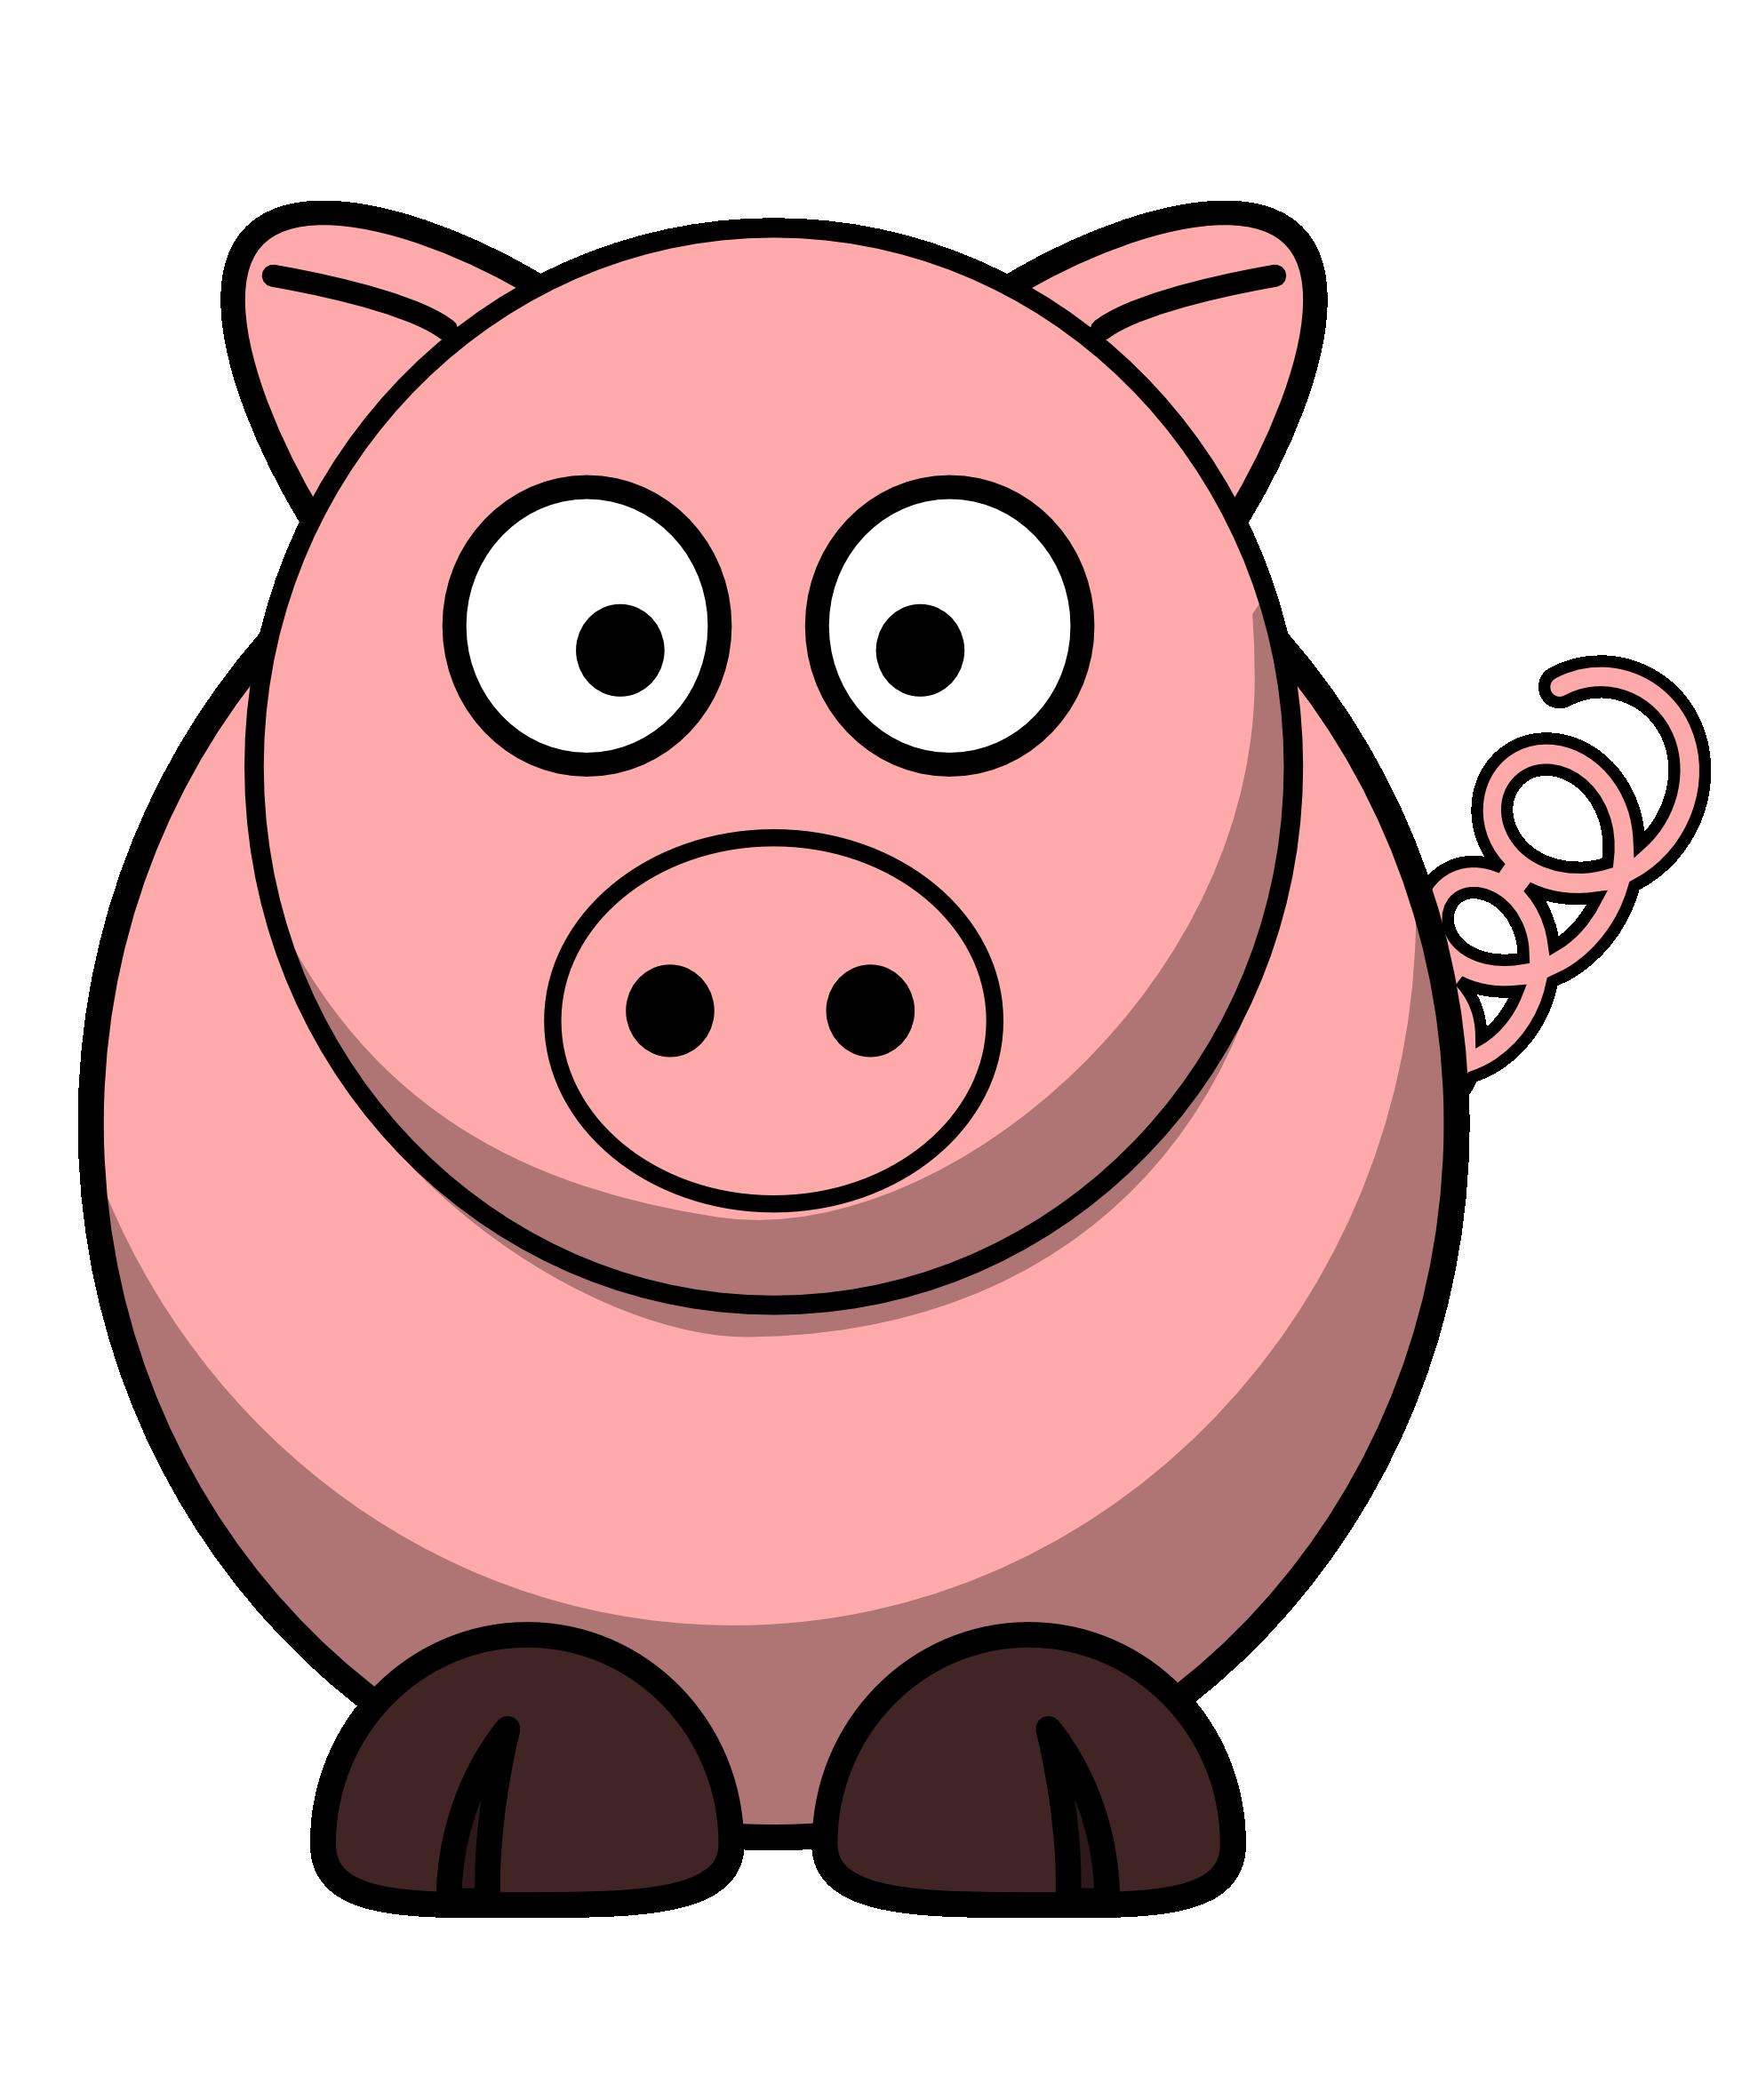 Pig Round Christmas Xmas Stuffed Animal Coloring Book ...